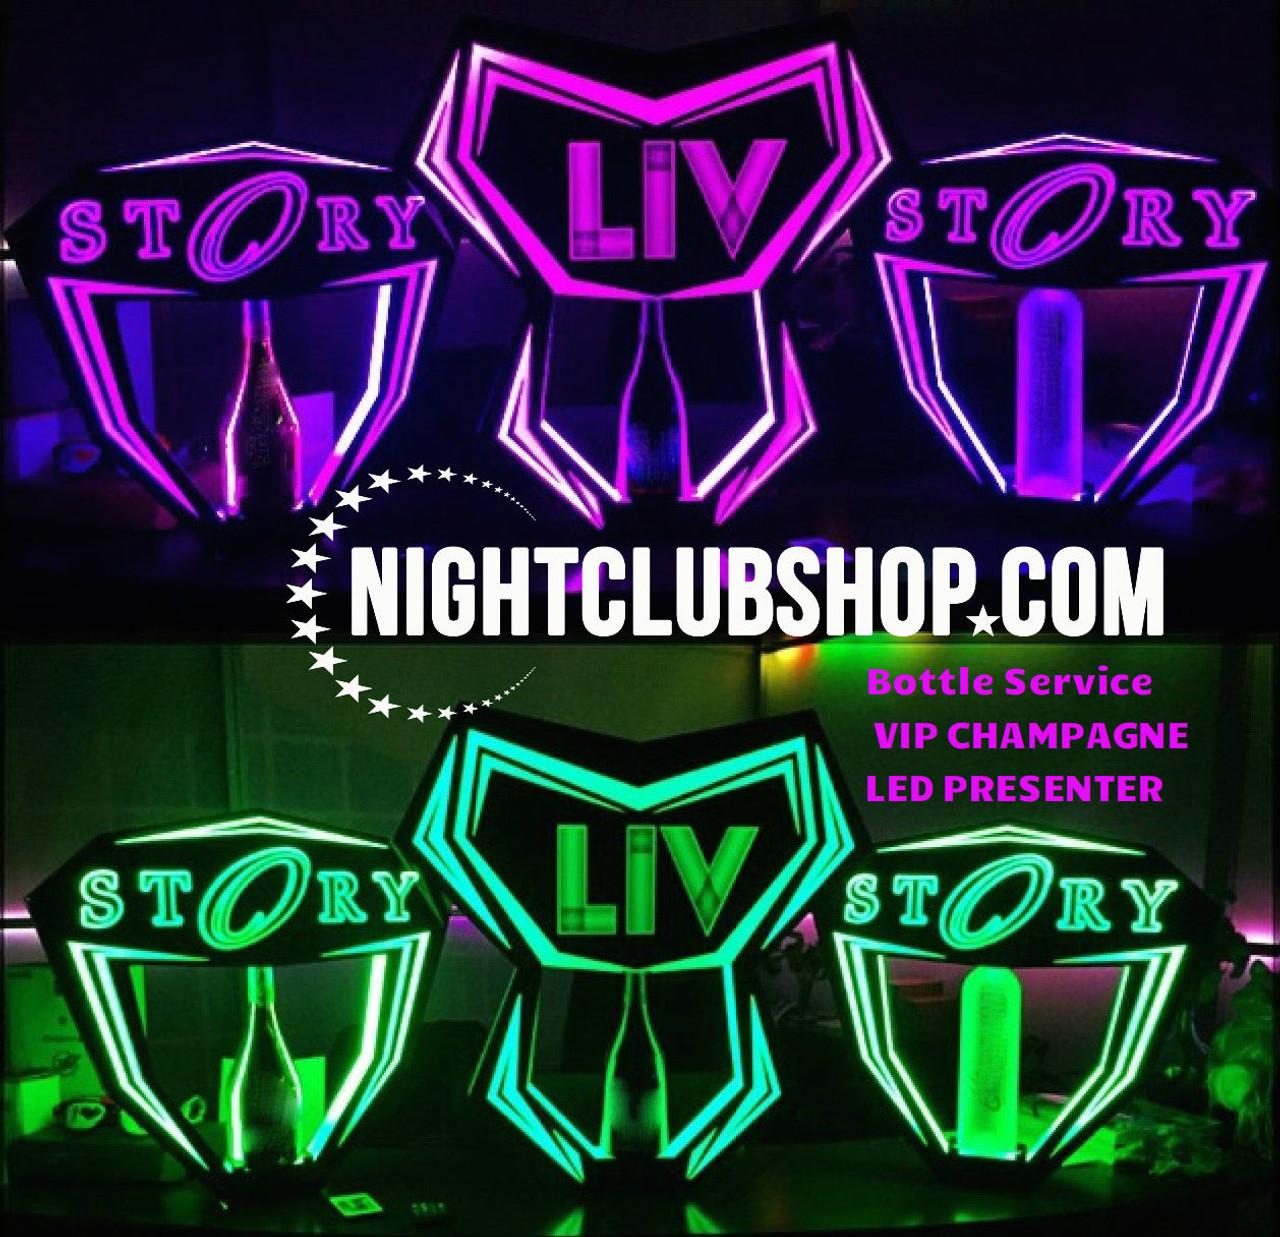 Miami,Champagne, 750 ml., Bottle,Service,Delivery,Hypemakerz,presentation, presenter,LED,LIV,Tray, Hype,LIV tray